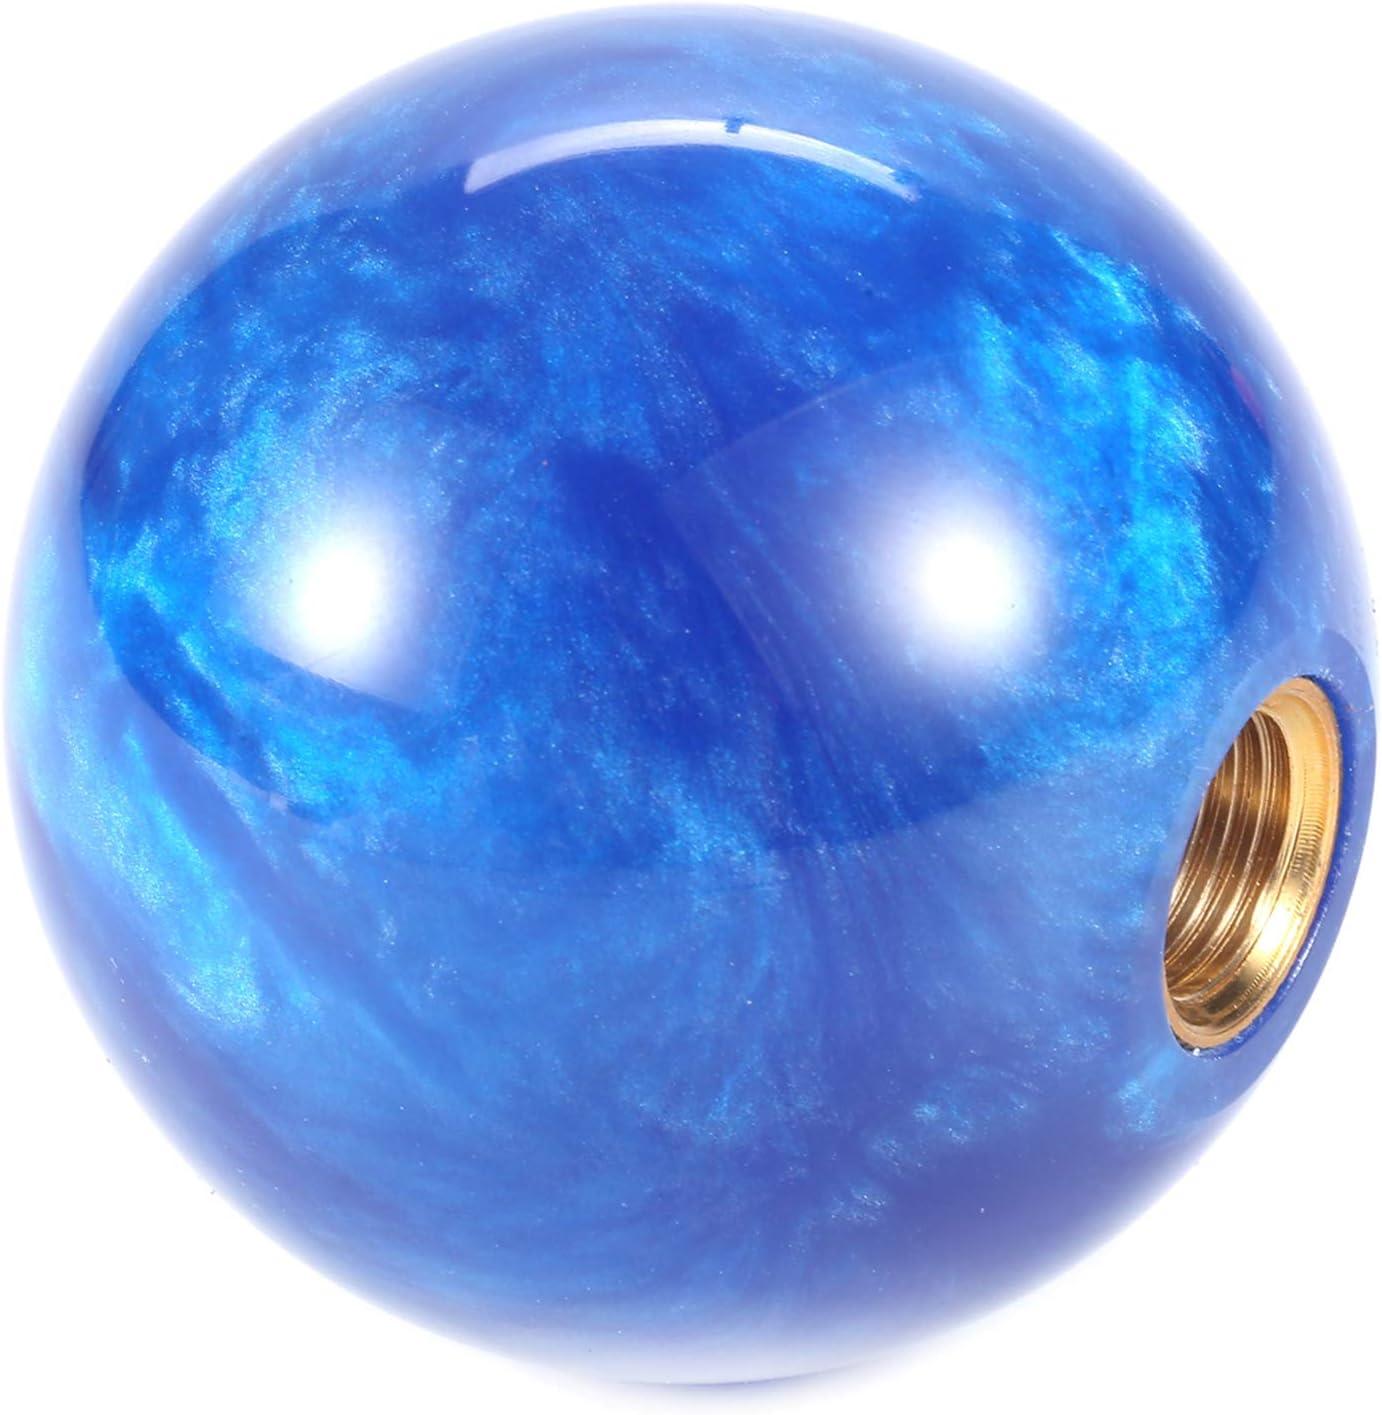 Bashineng Transmission Shifter Head Ball Shape Gear Stick Shift Knob Fit Most Manual Automatic Car Blue